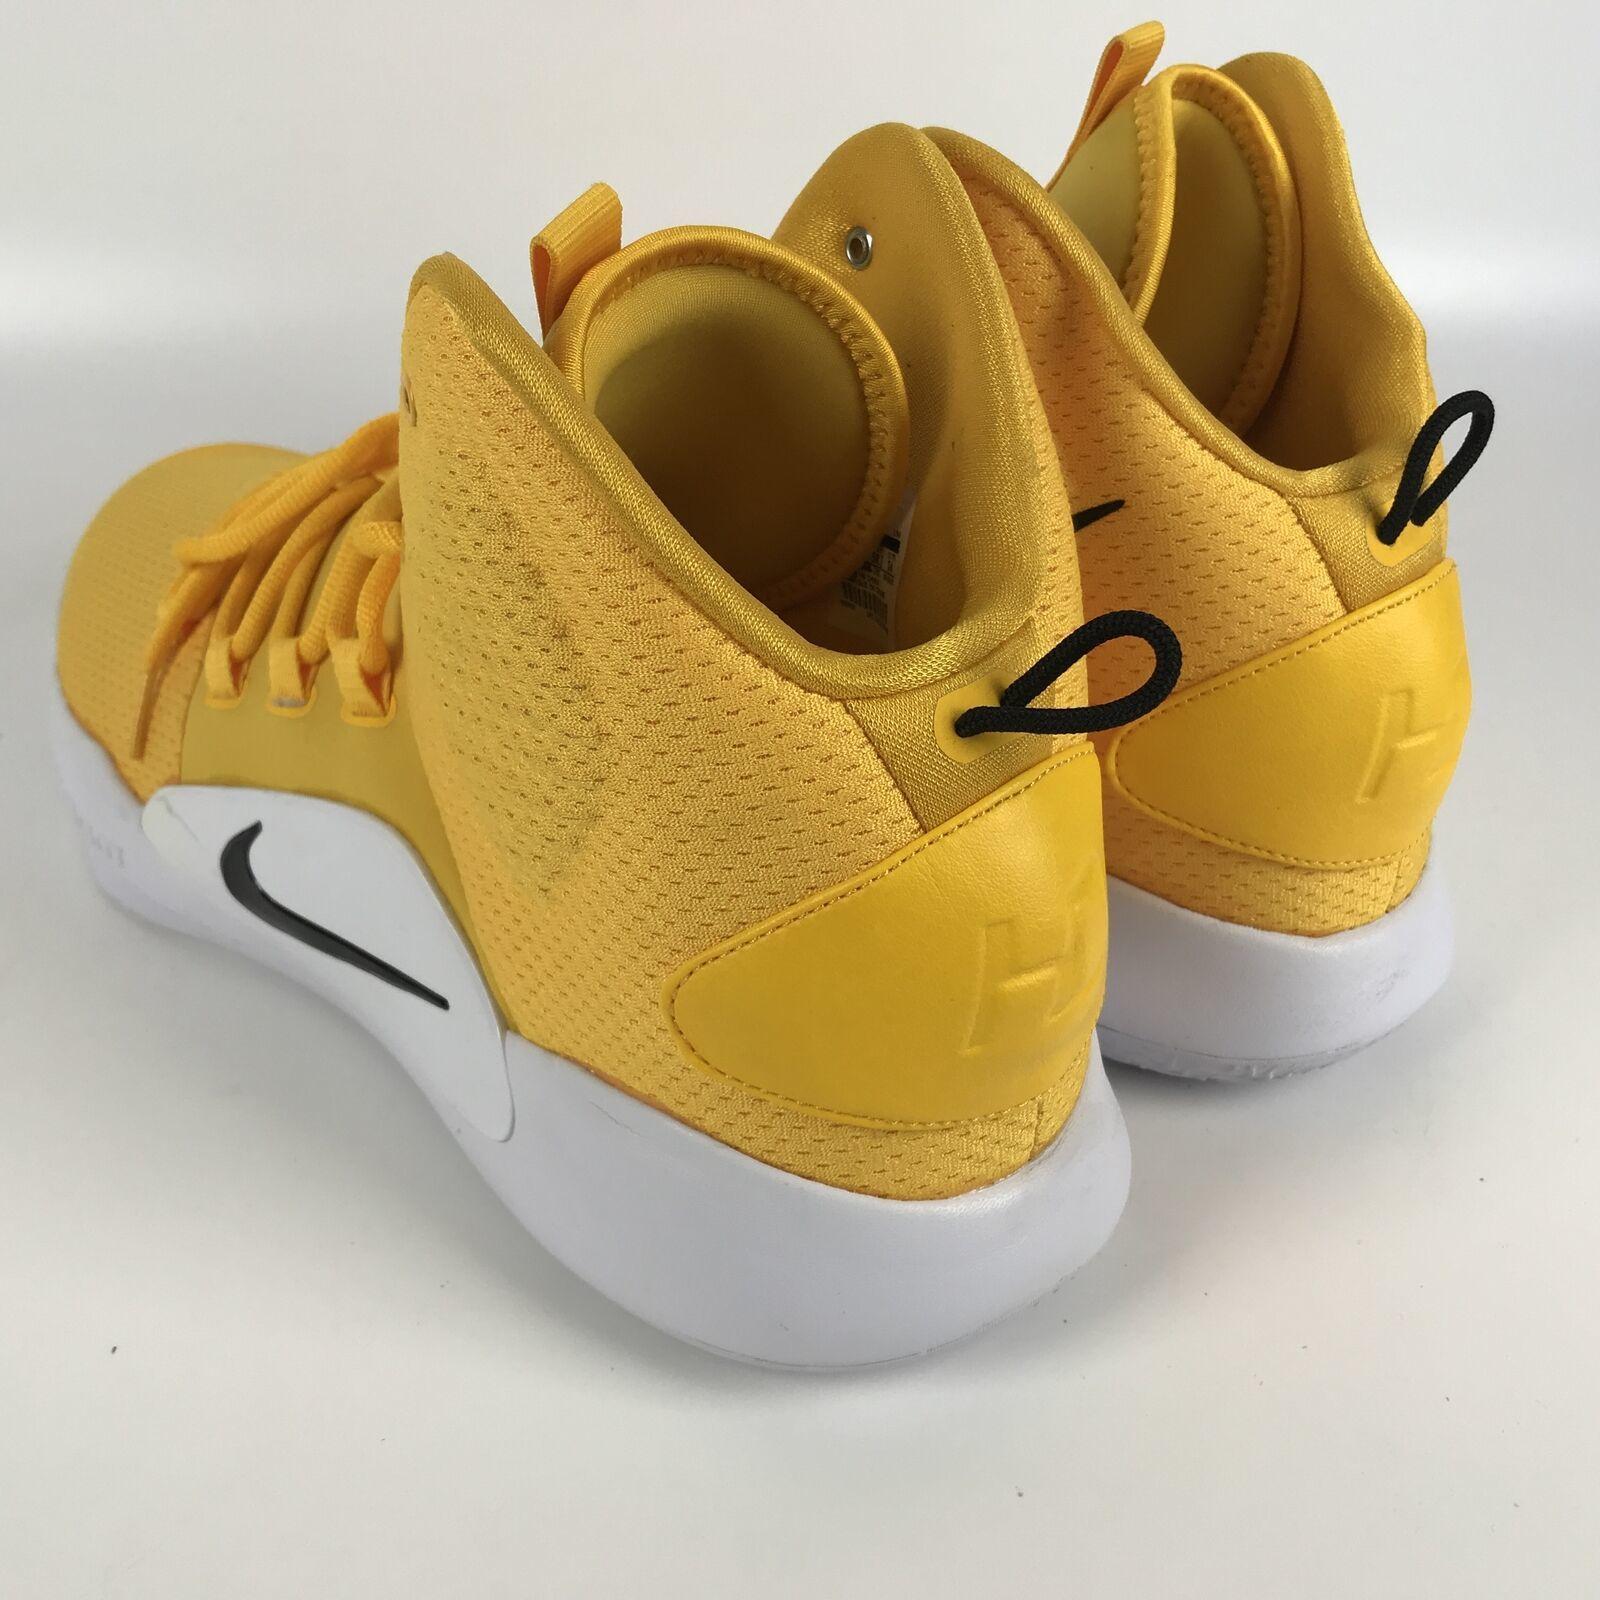 Nike Hyperdunk X TB yellow Men's size 16 Basketball Shoes AT3866 701 image 4